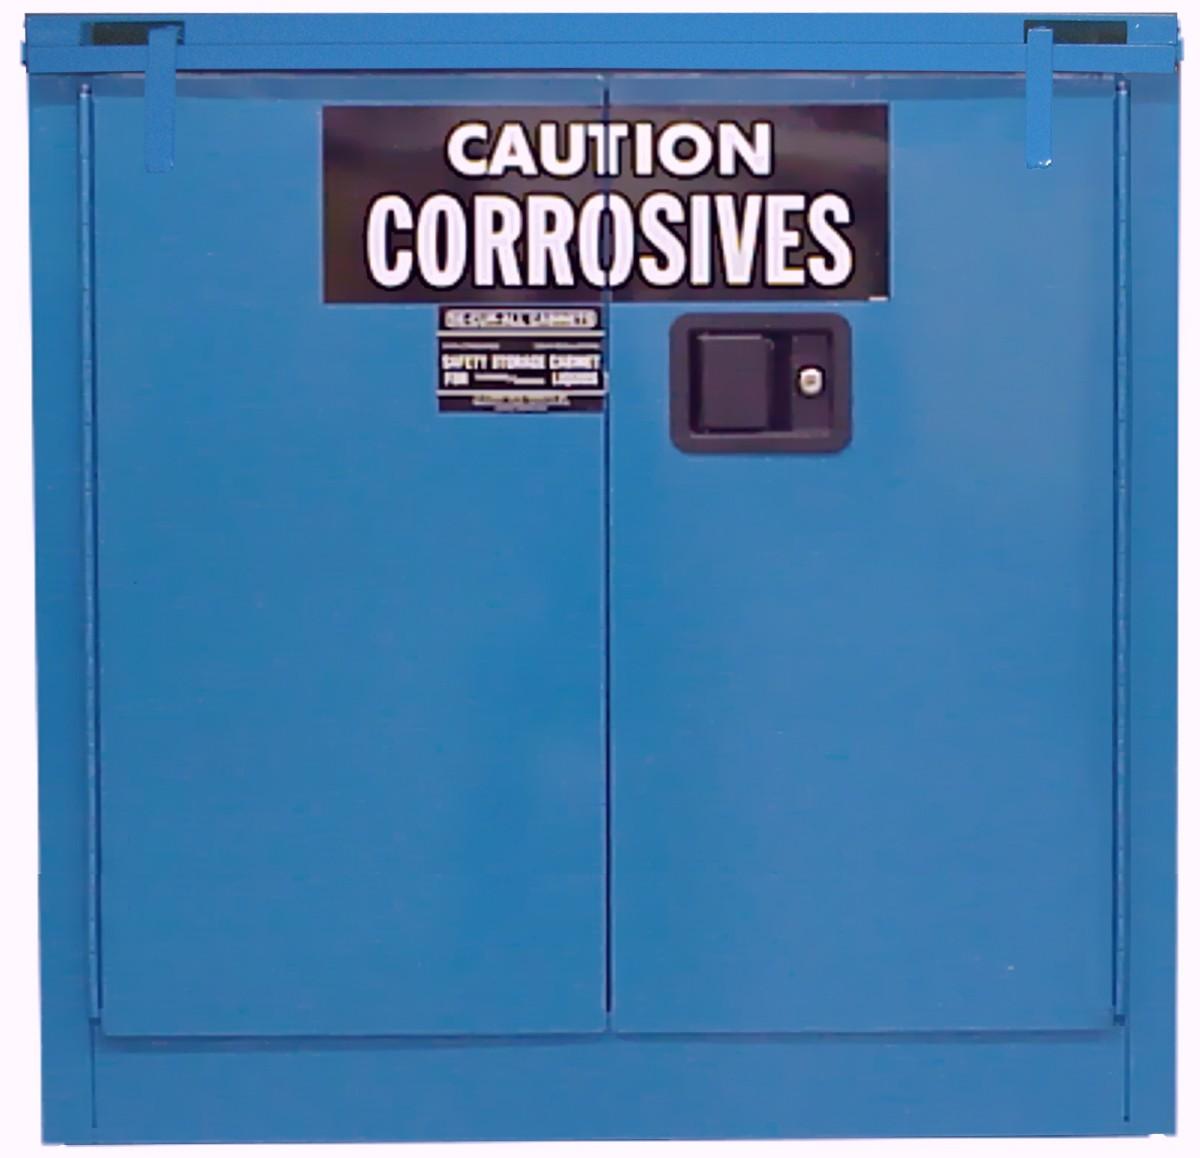 C330 - Acid/Corrosive Storage Cabinet - 30 Gal. Self-Close, Self-Latch Safe-T-Door